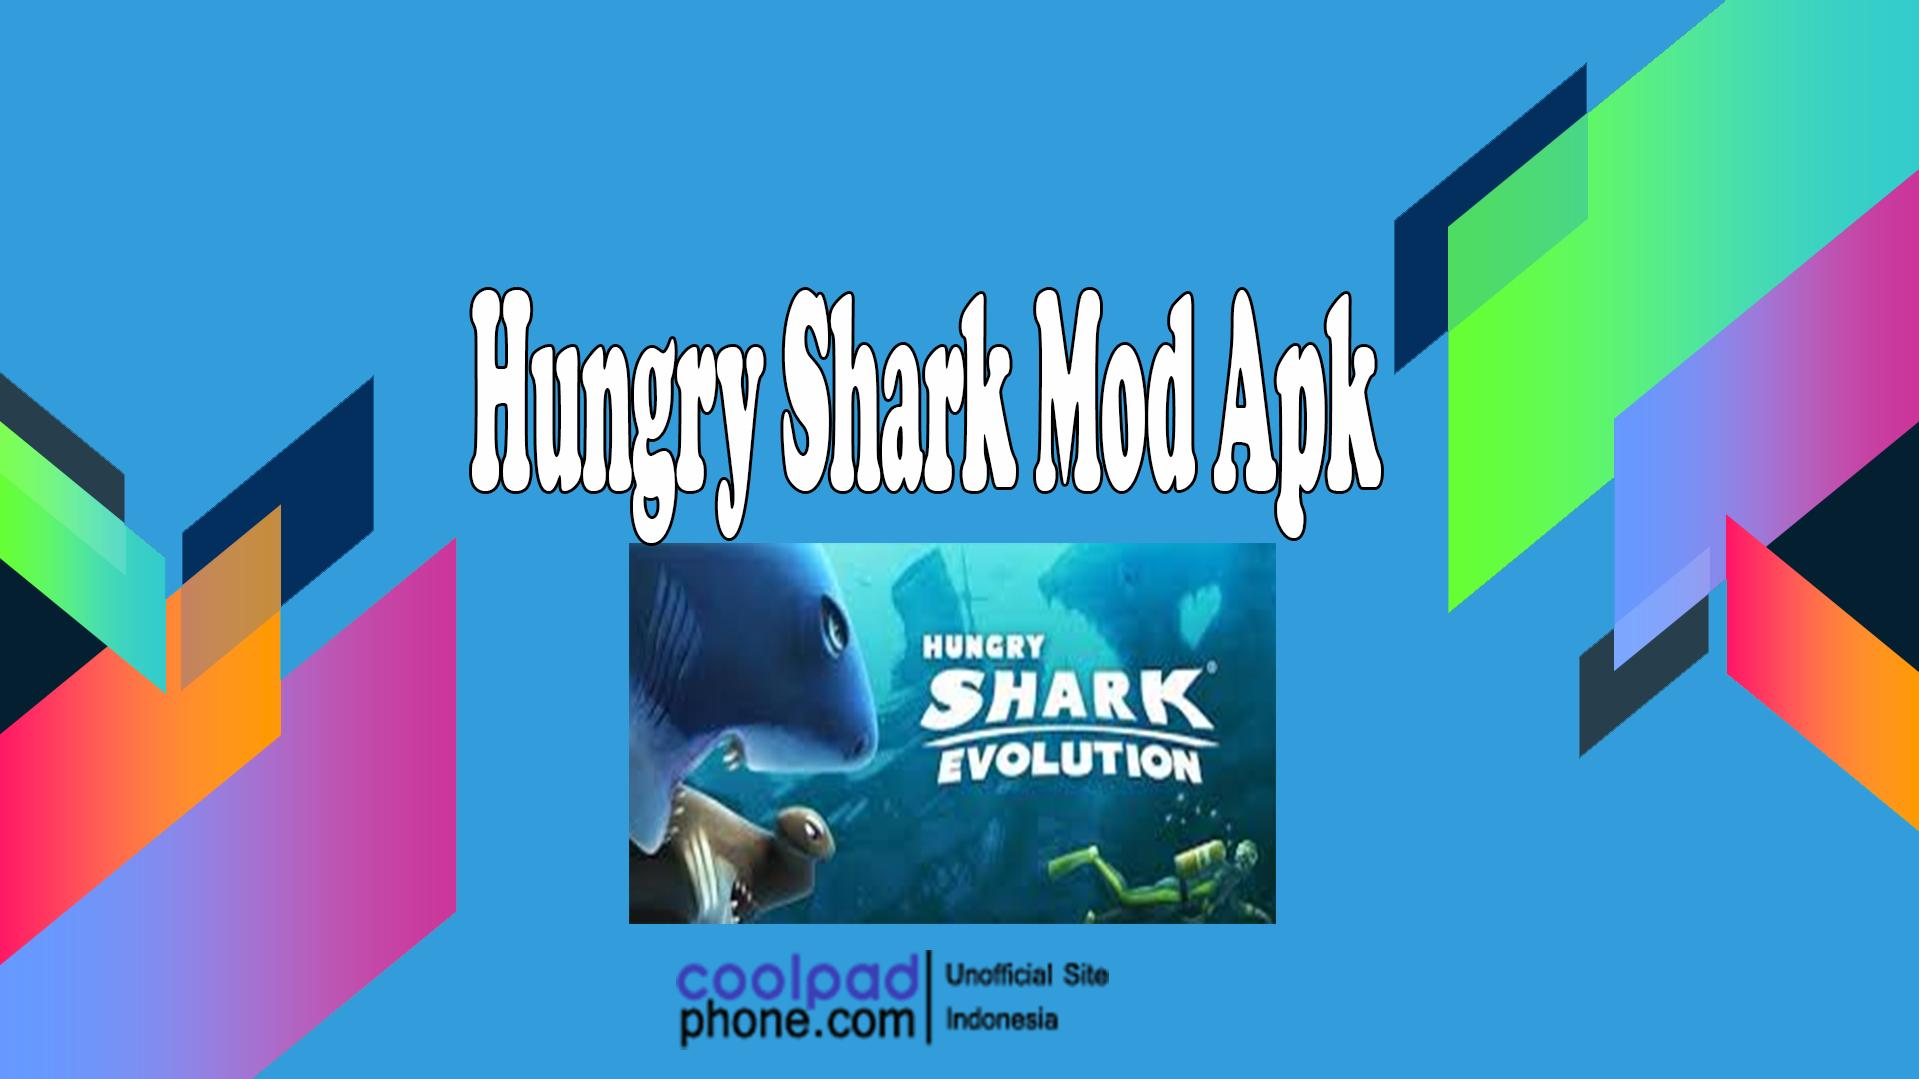 Hungry-Shark-Mod-Apk